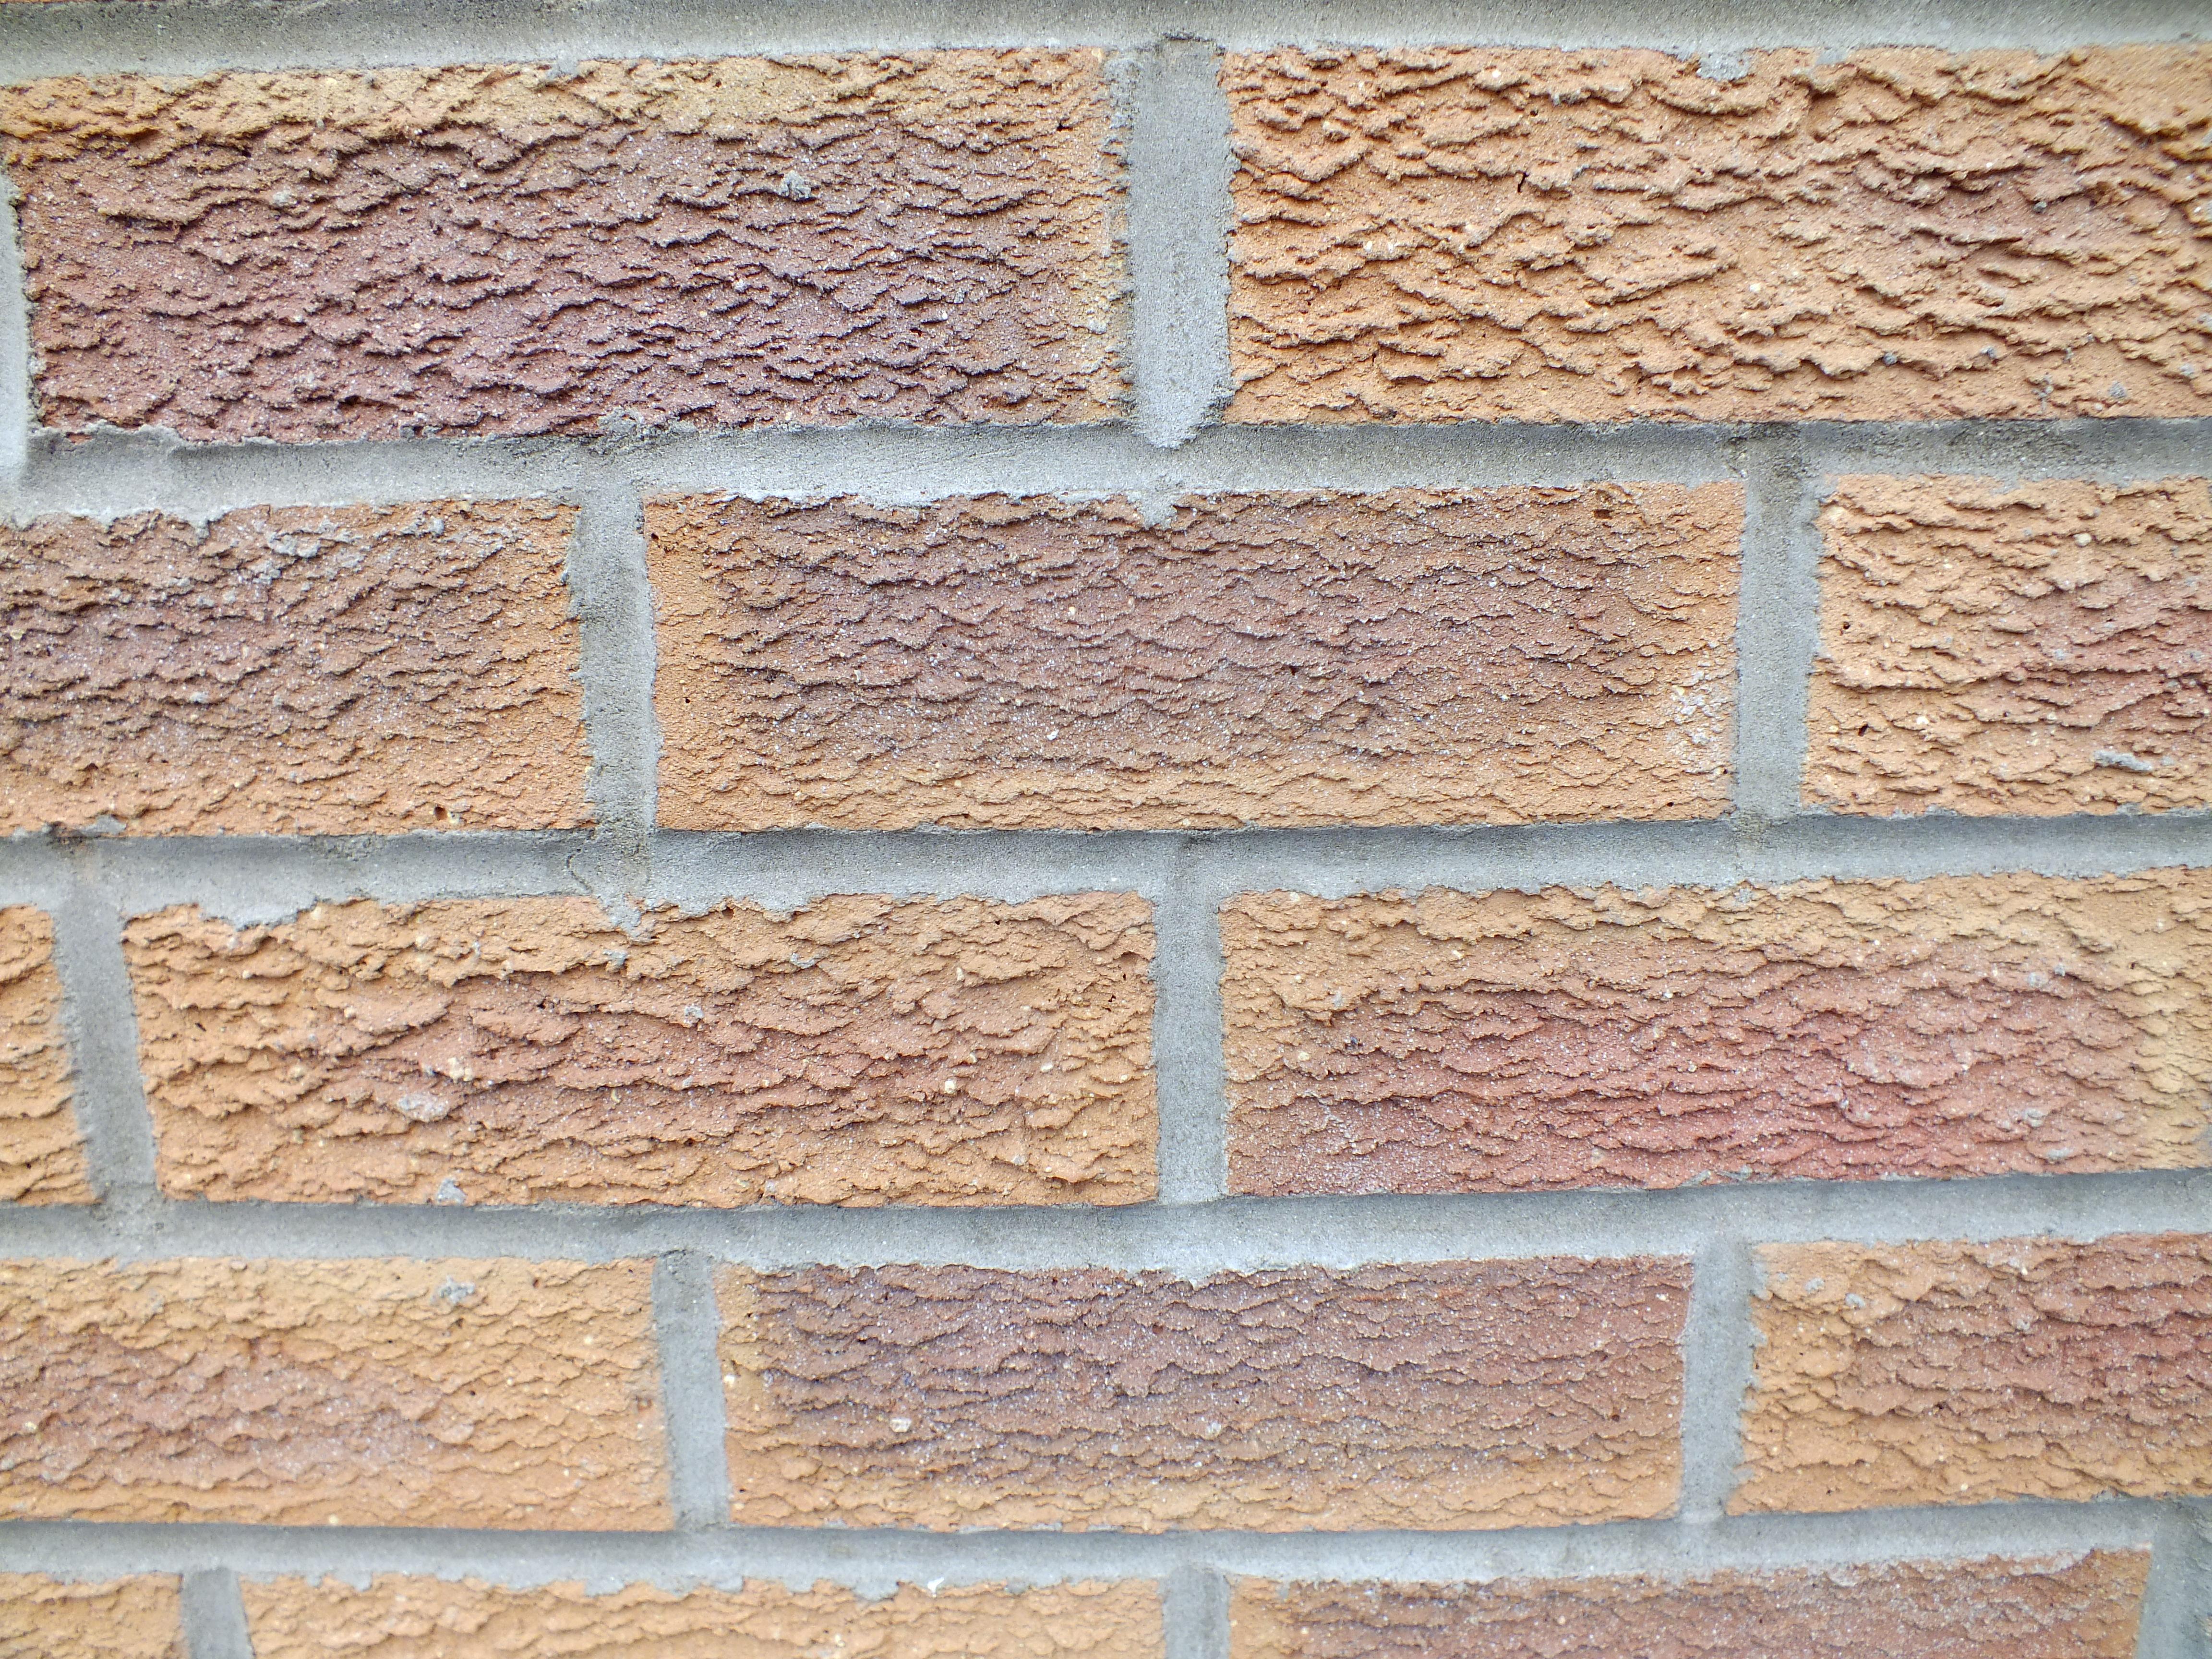 Brick, Bricks, Stone, Texture, Wall, HQ Photo